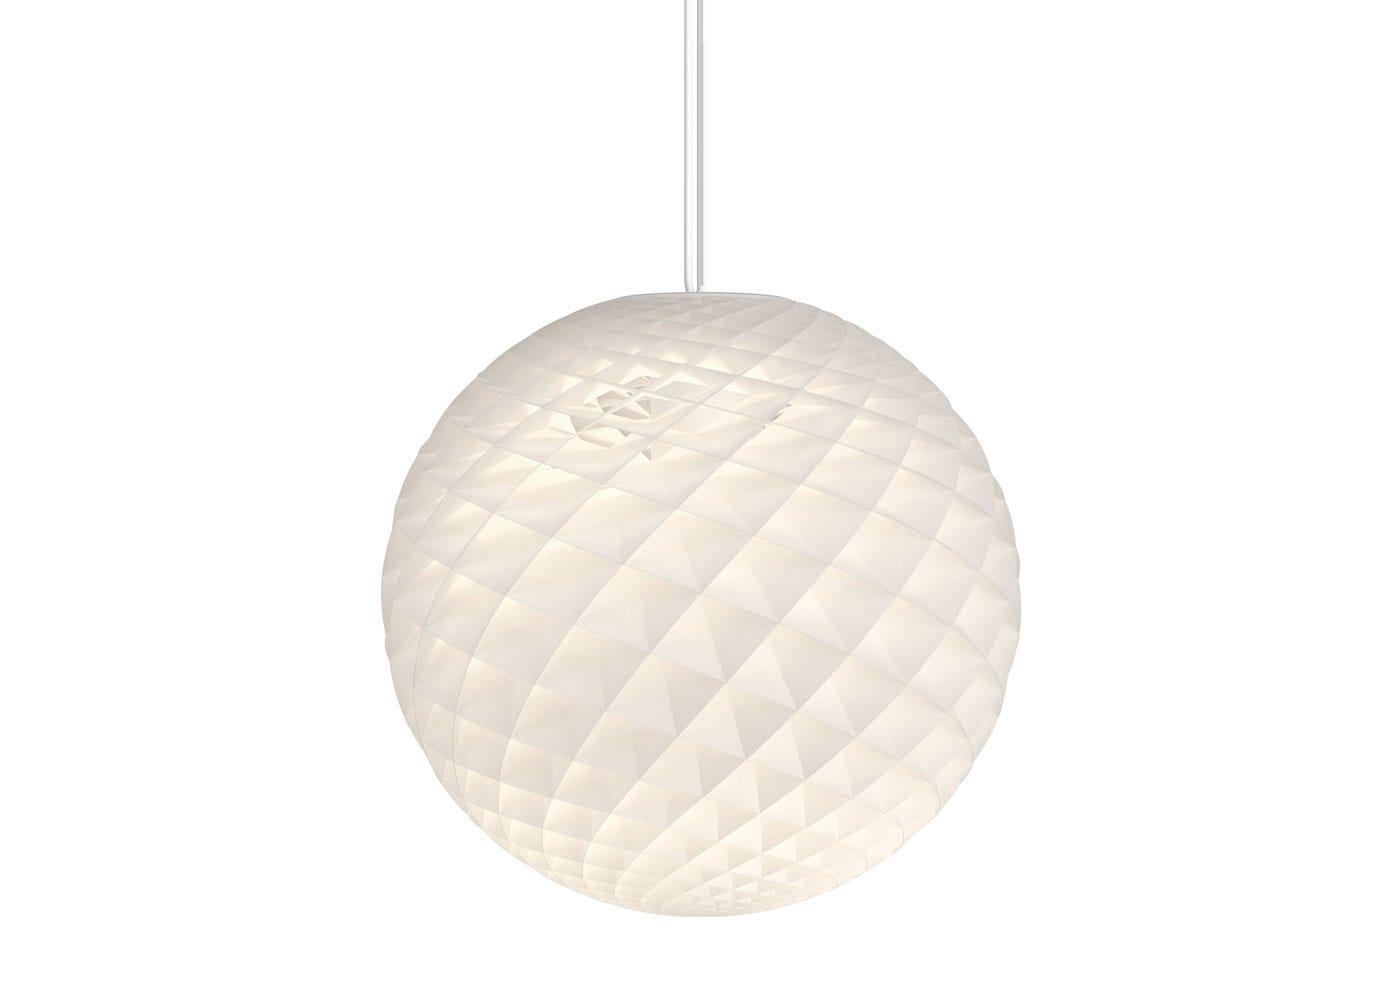 Patera Pendant Light White Dia 60cm